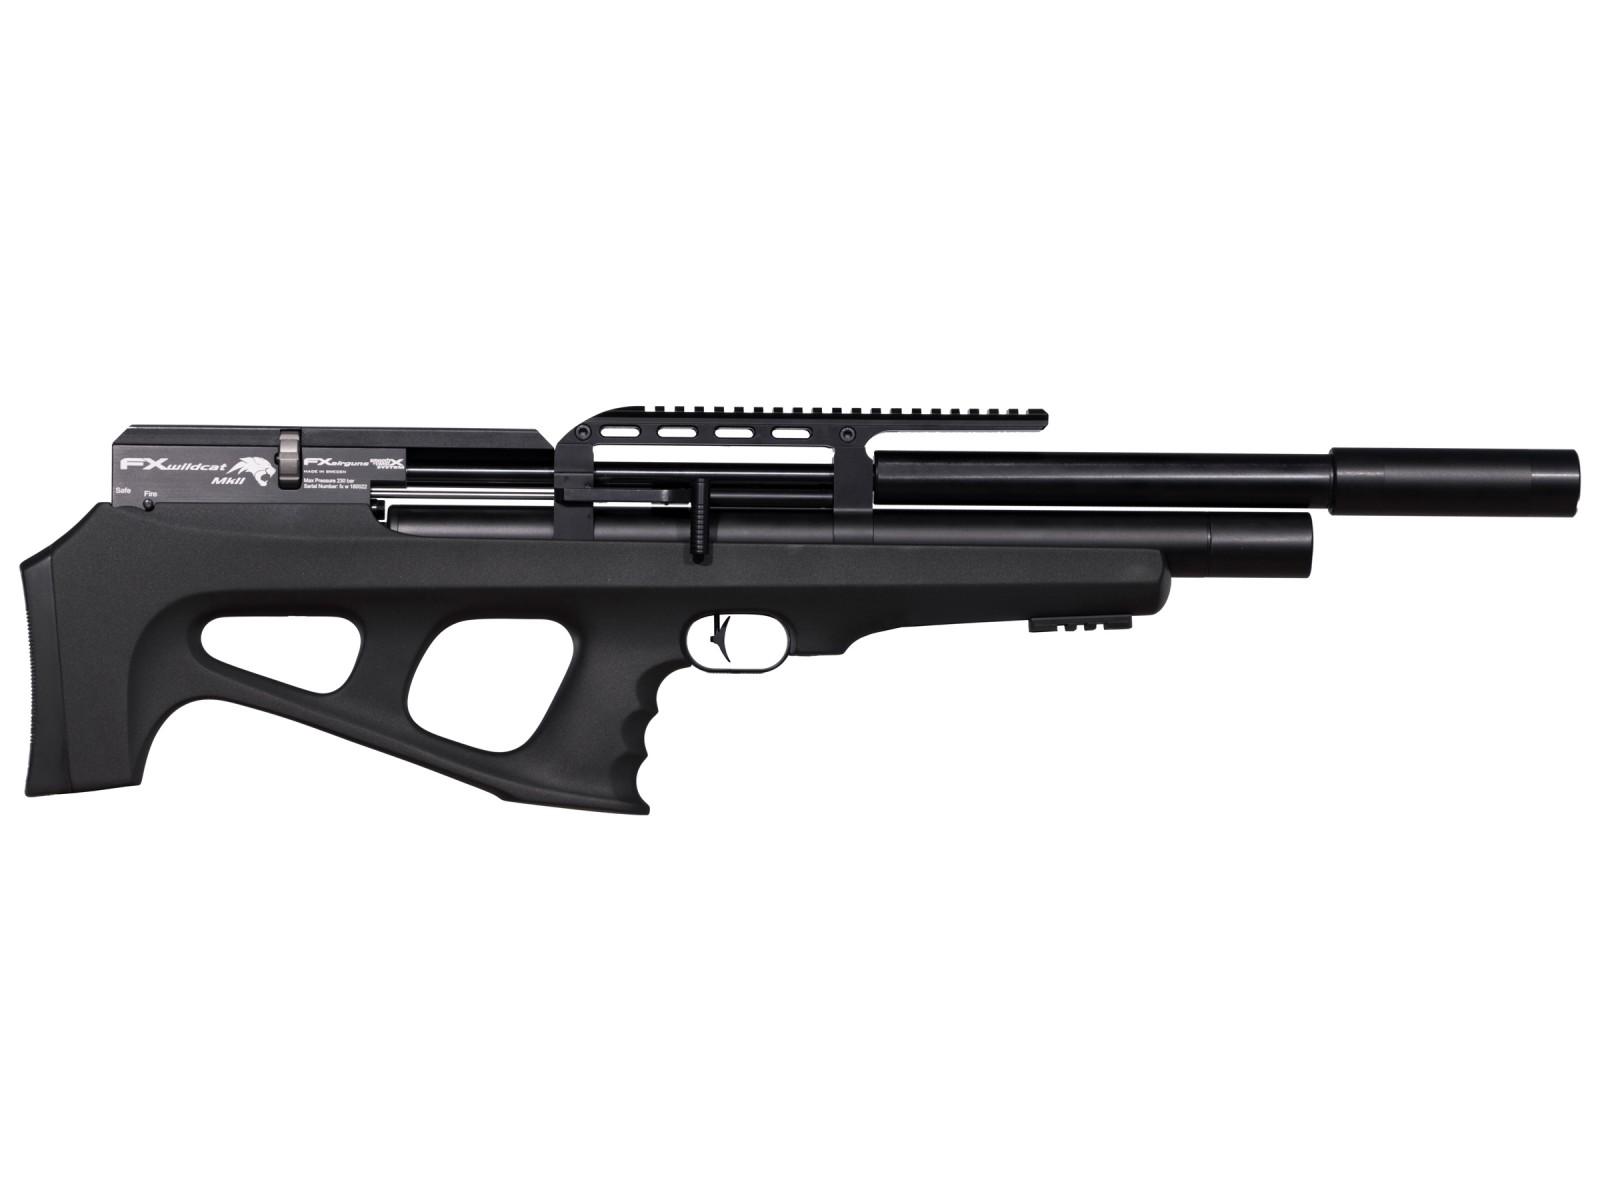 FX Wildcat MK II Compact, Synthetic,  25 caliber